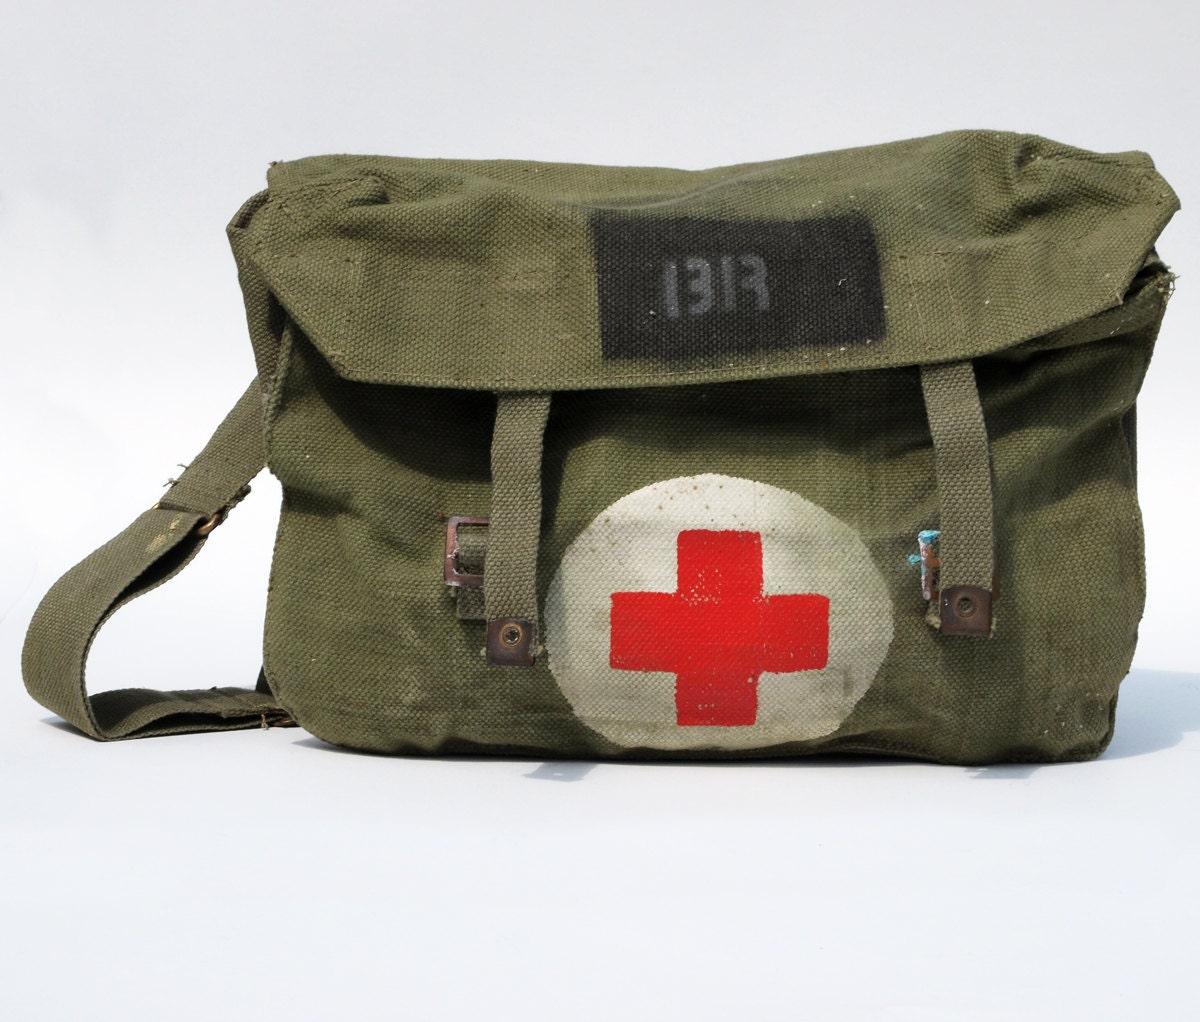 wwii medic bag vintage canvas green sack cross